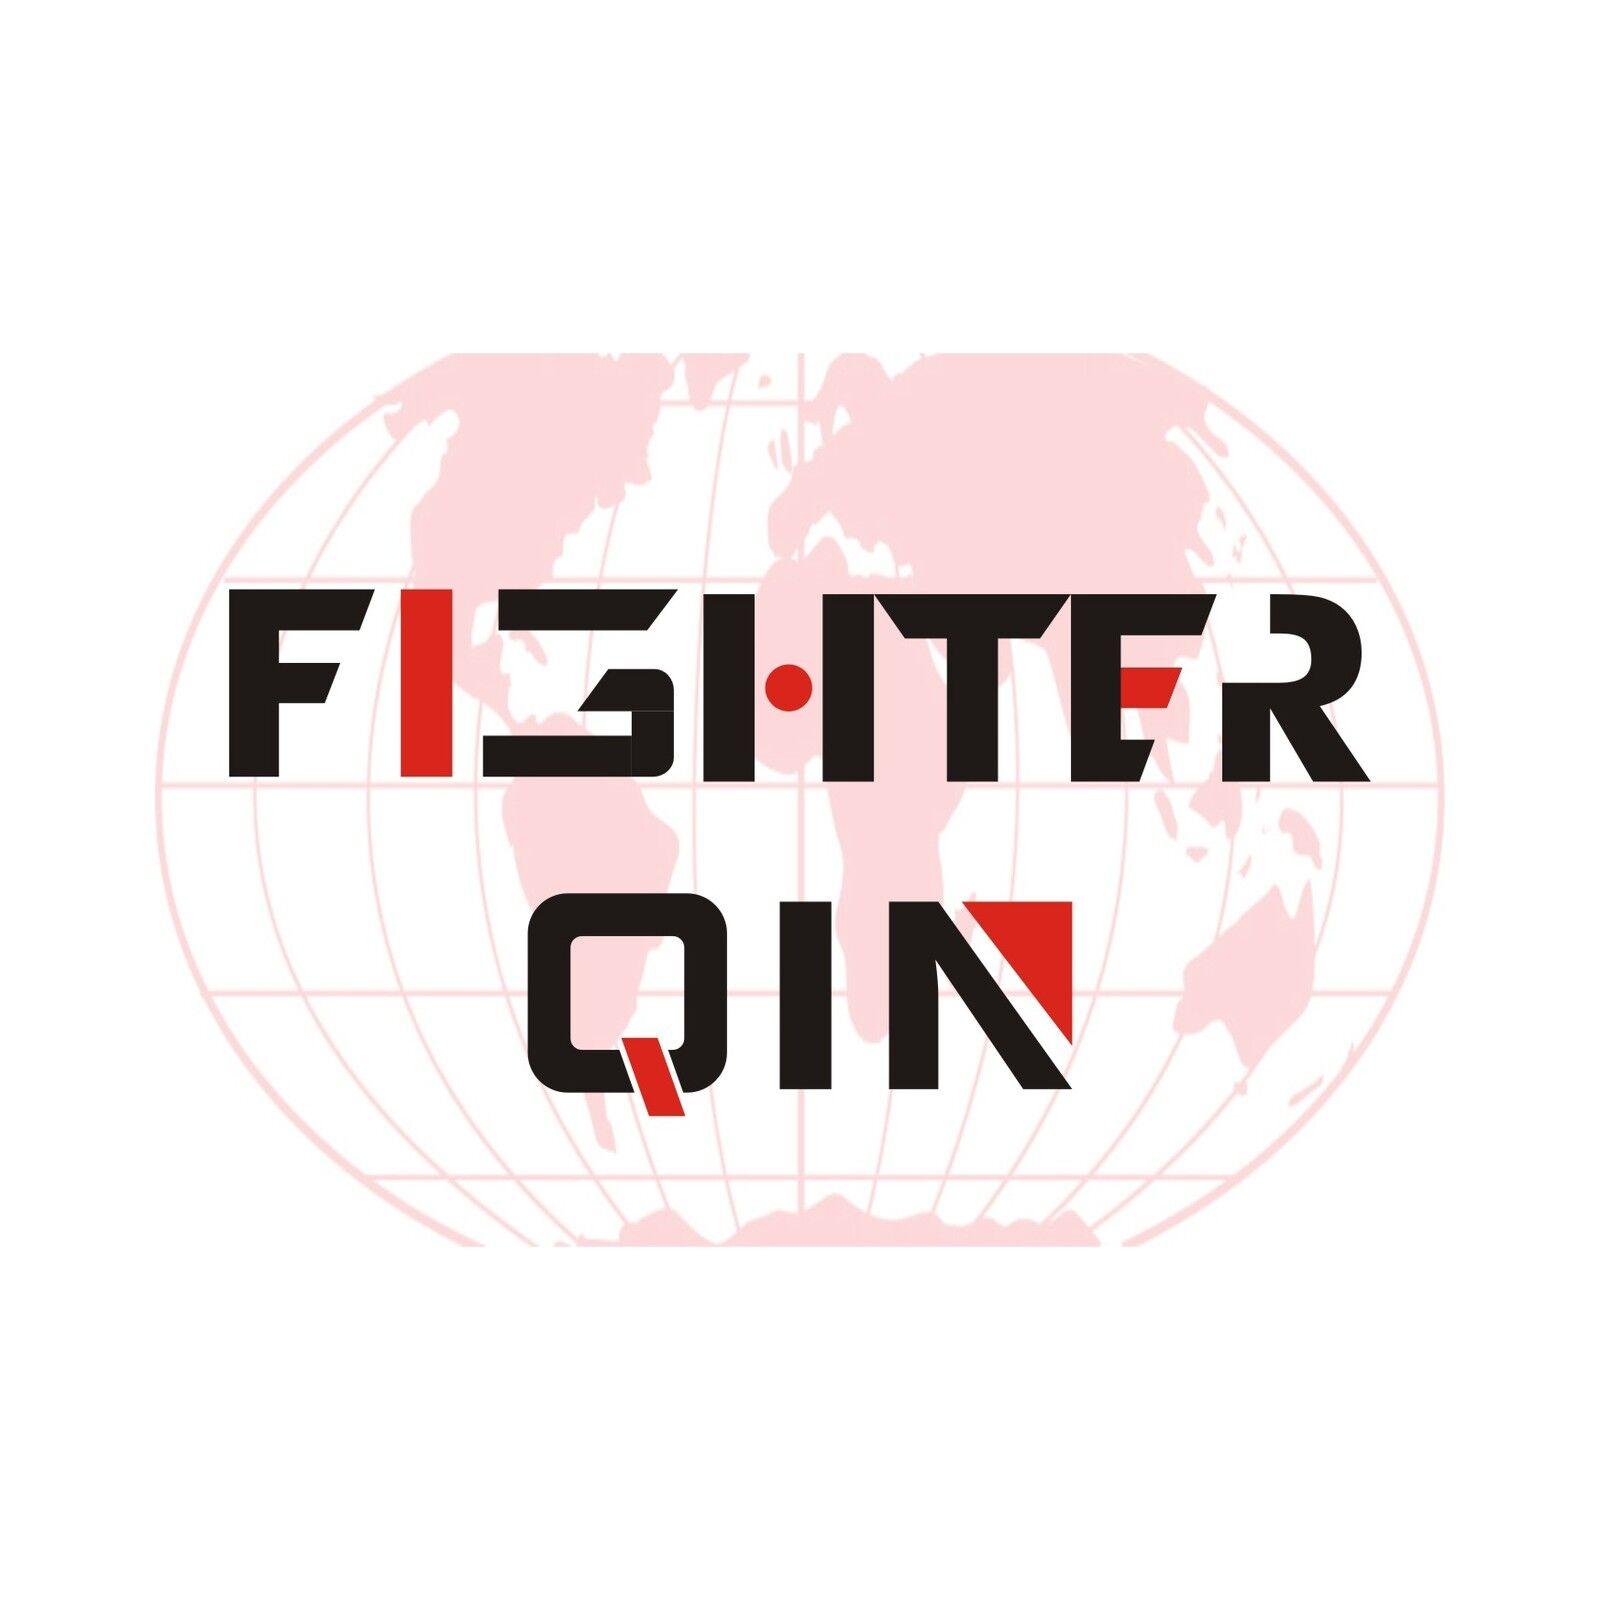 Fighter_Qin